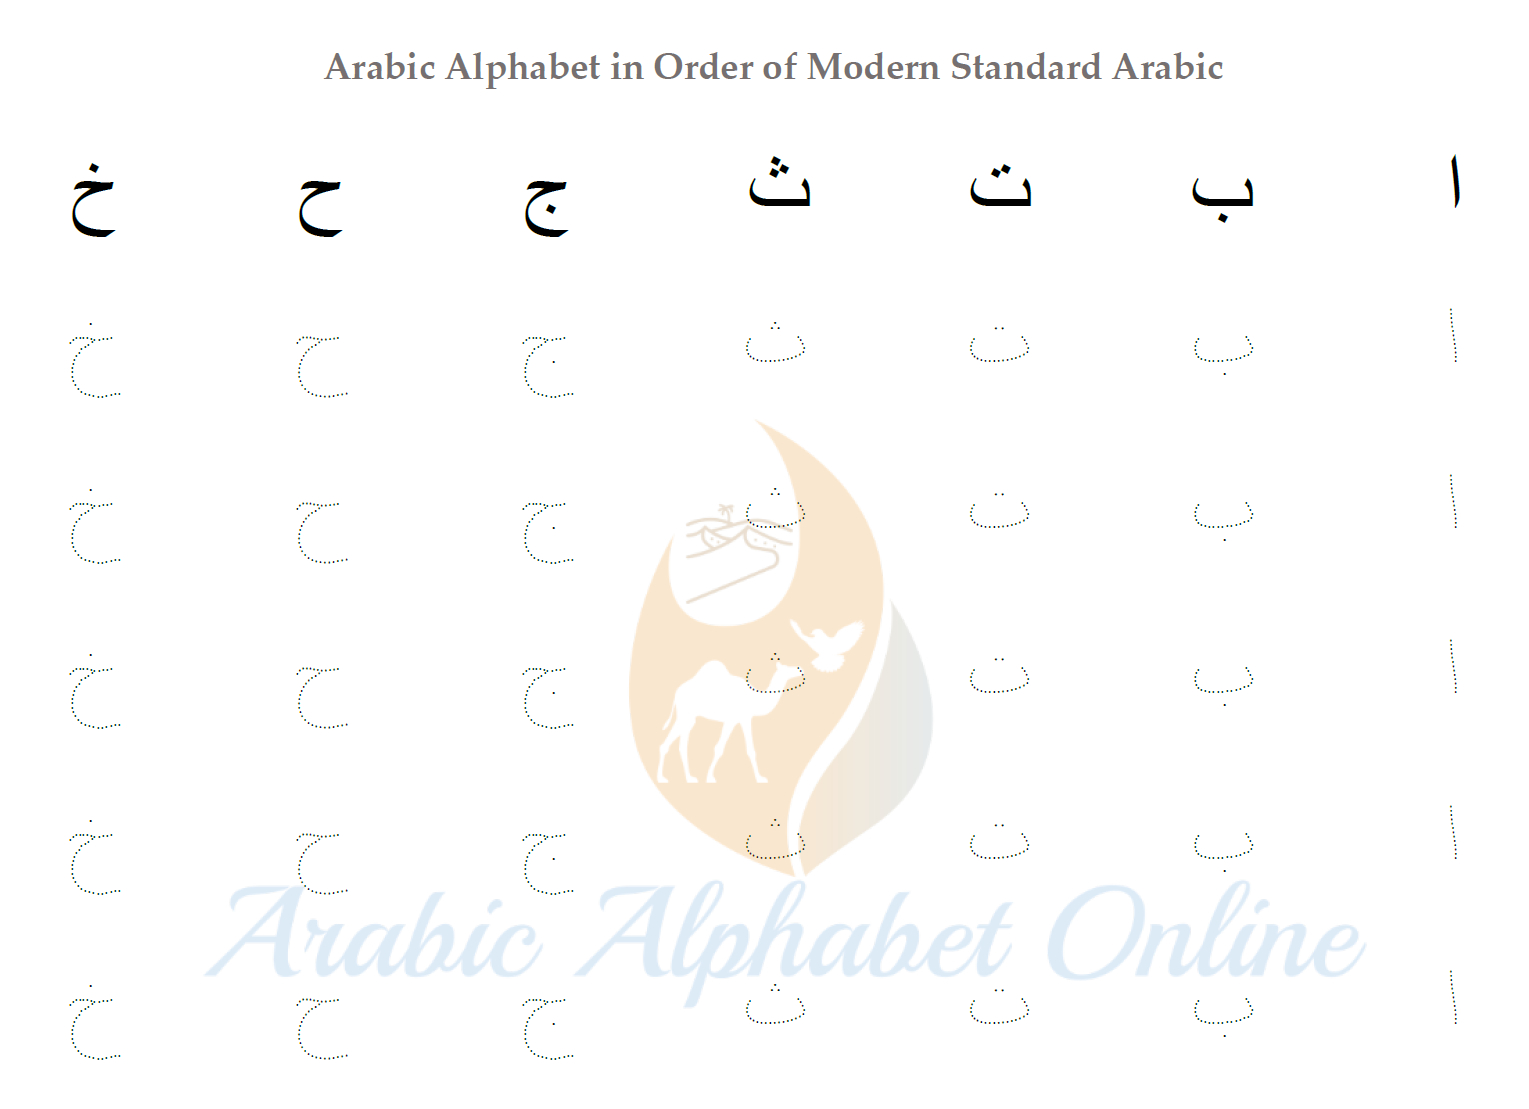 Arabic Alphabet Tracing Worksheets | Arabic Alphabet Online throughout Letter Tracing Worksheets Online